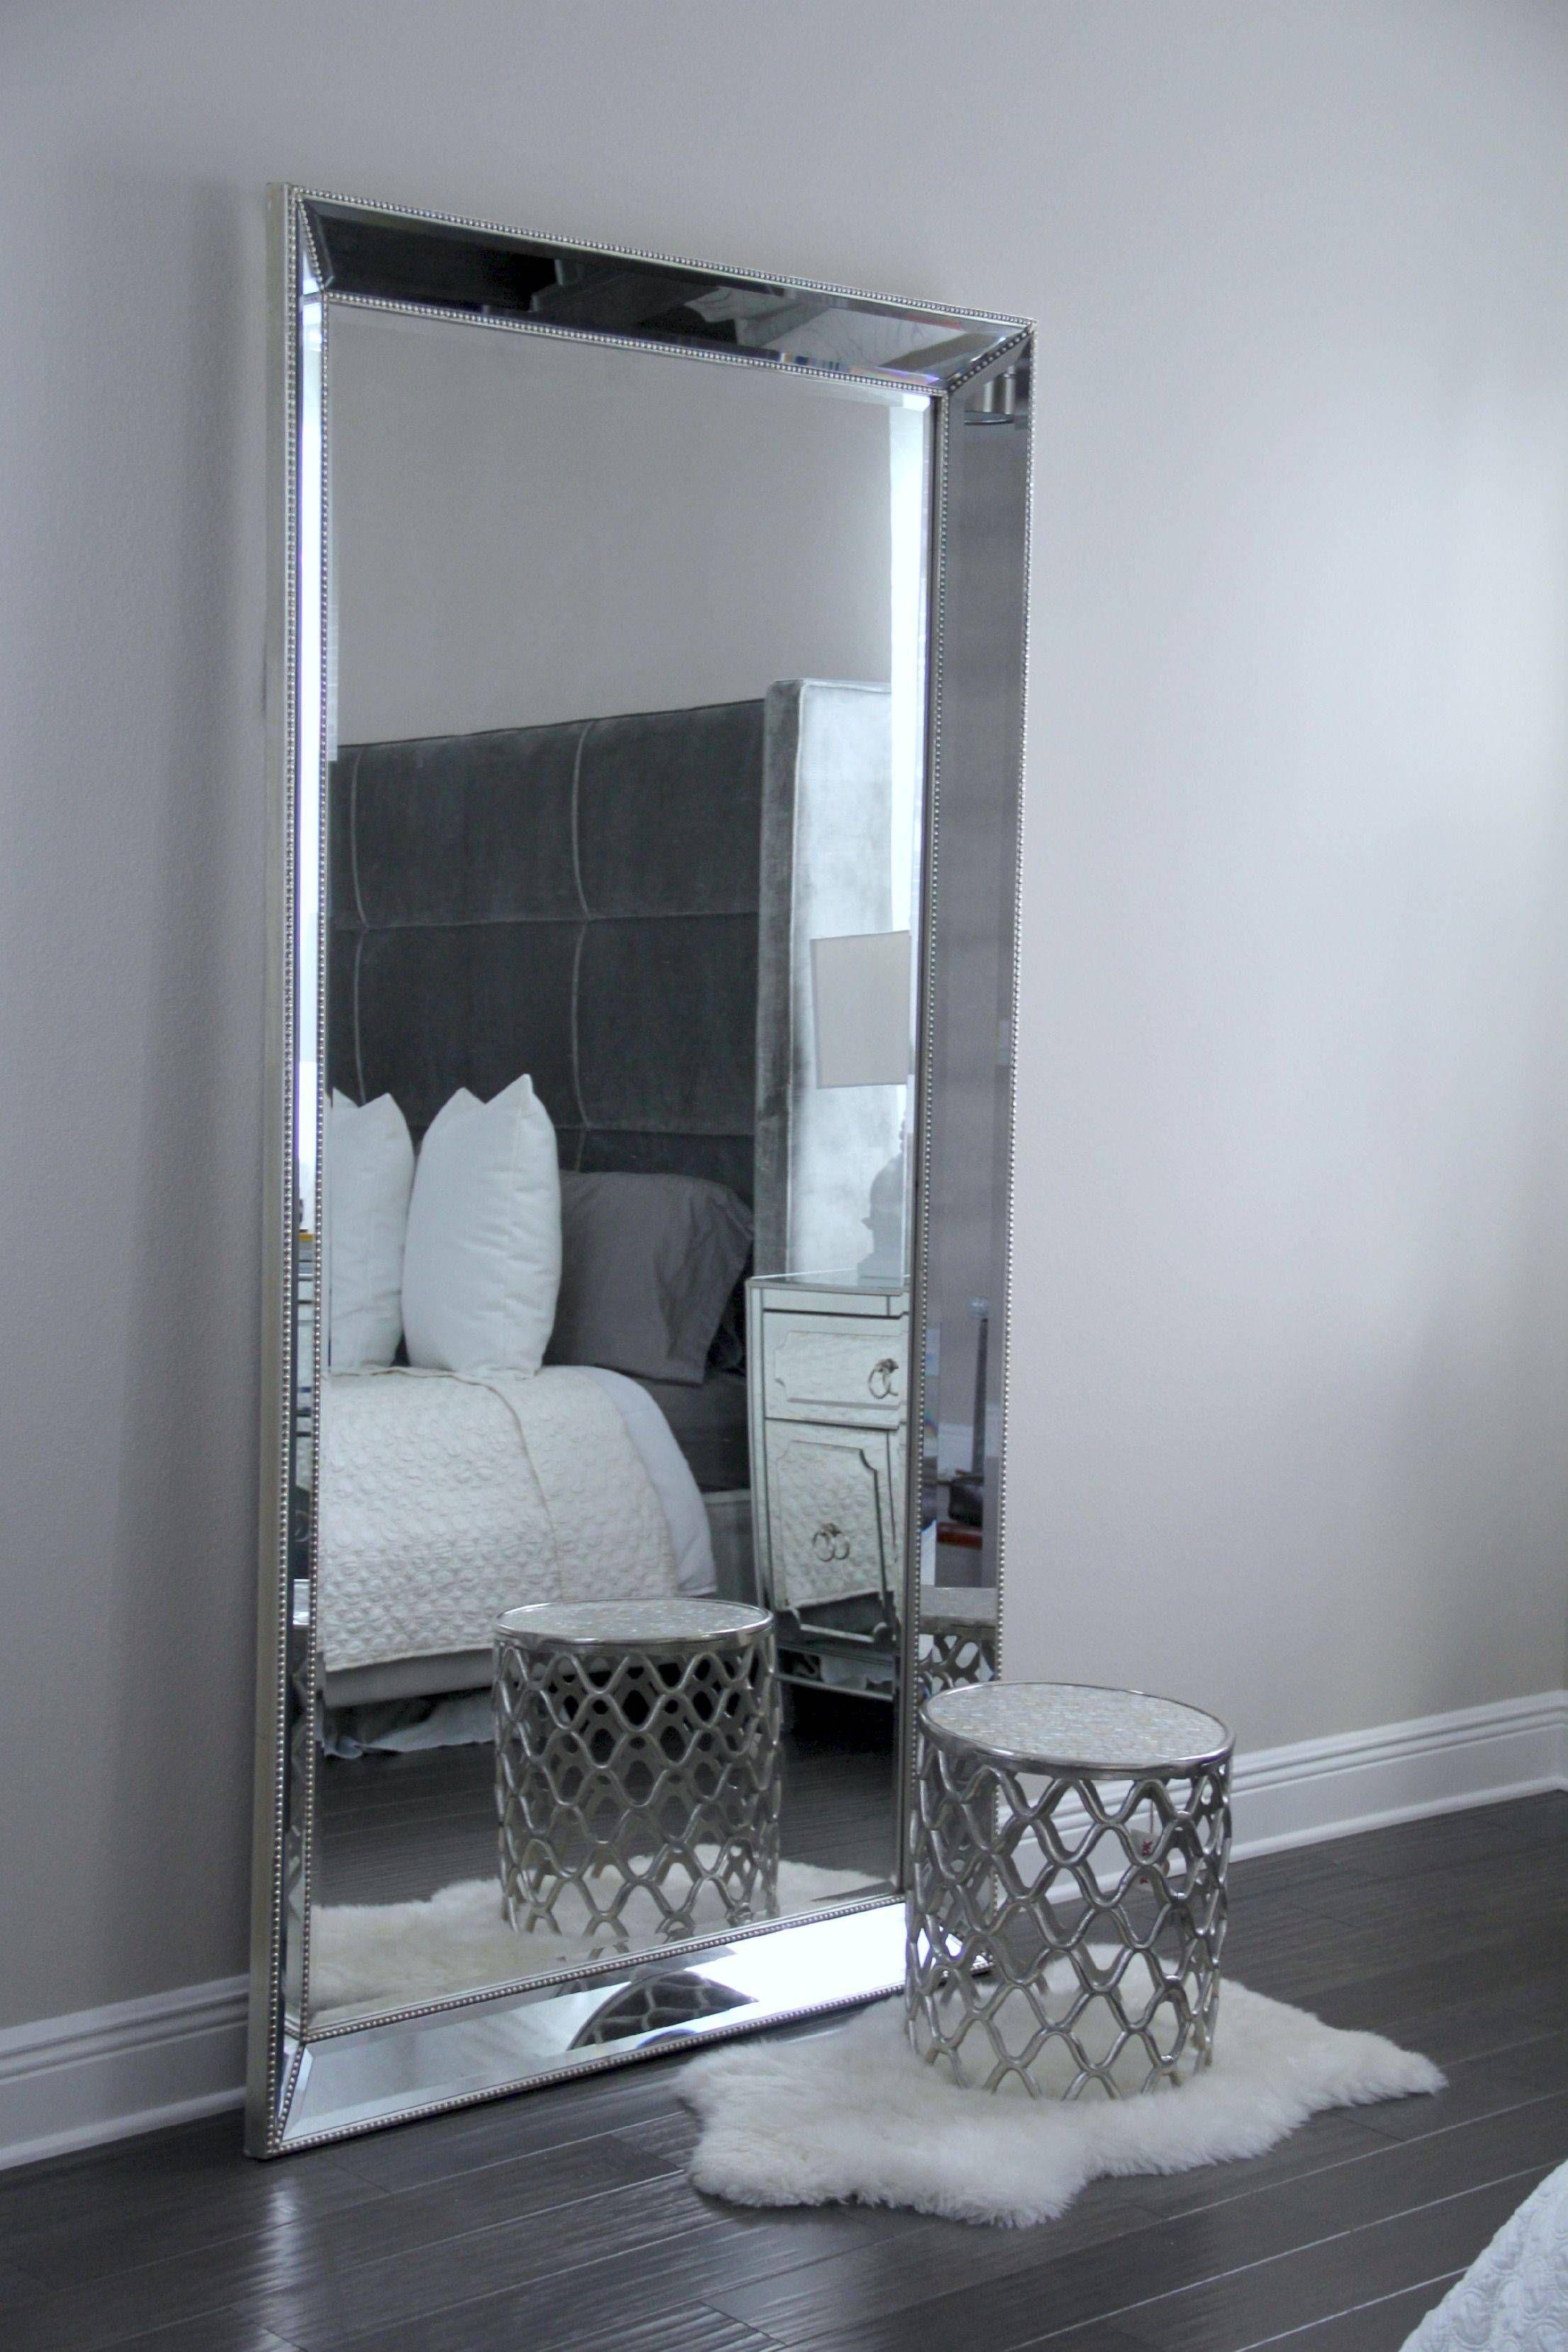 Decorative Full Length Mirror Mirrored Bedroom Furniture Room Decor Home Decor